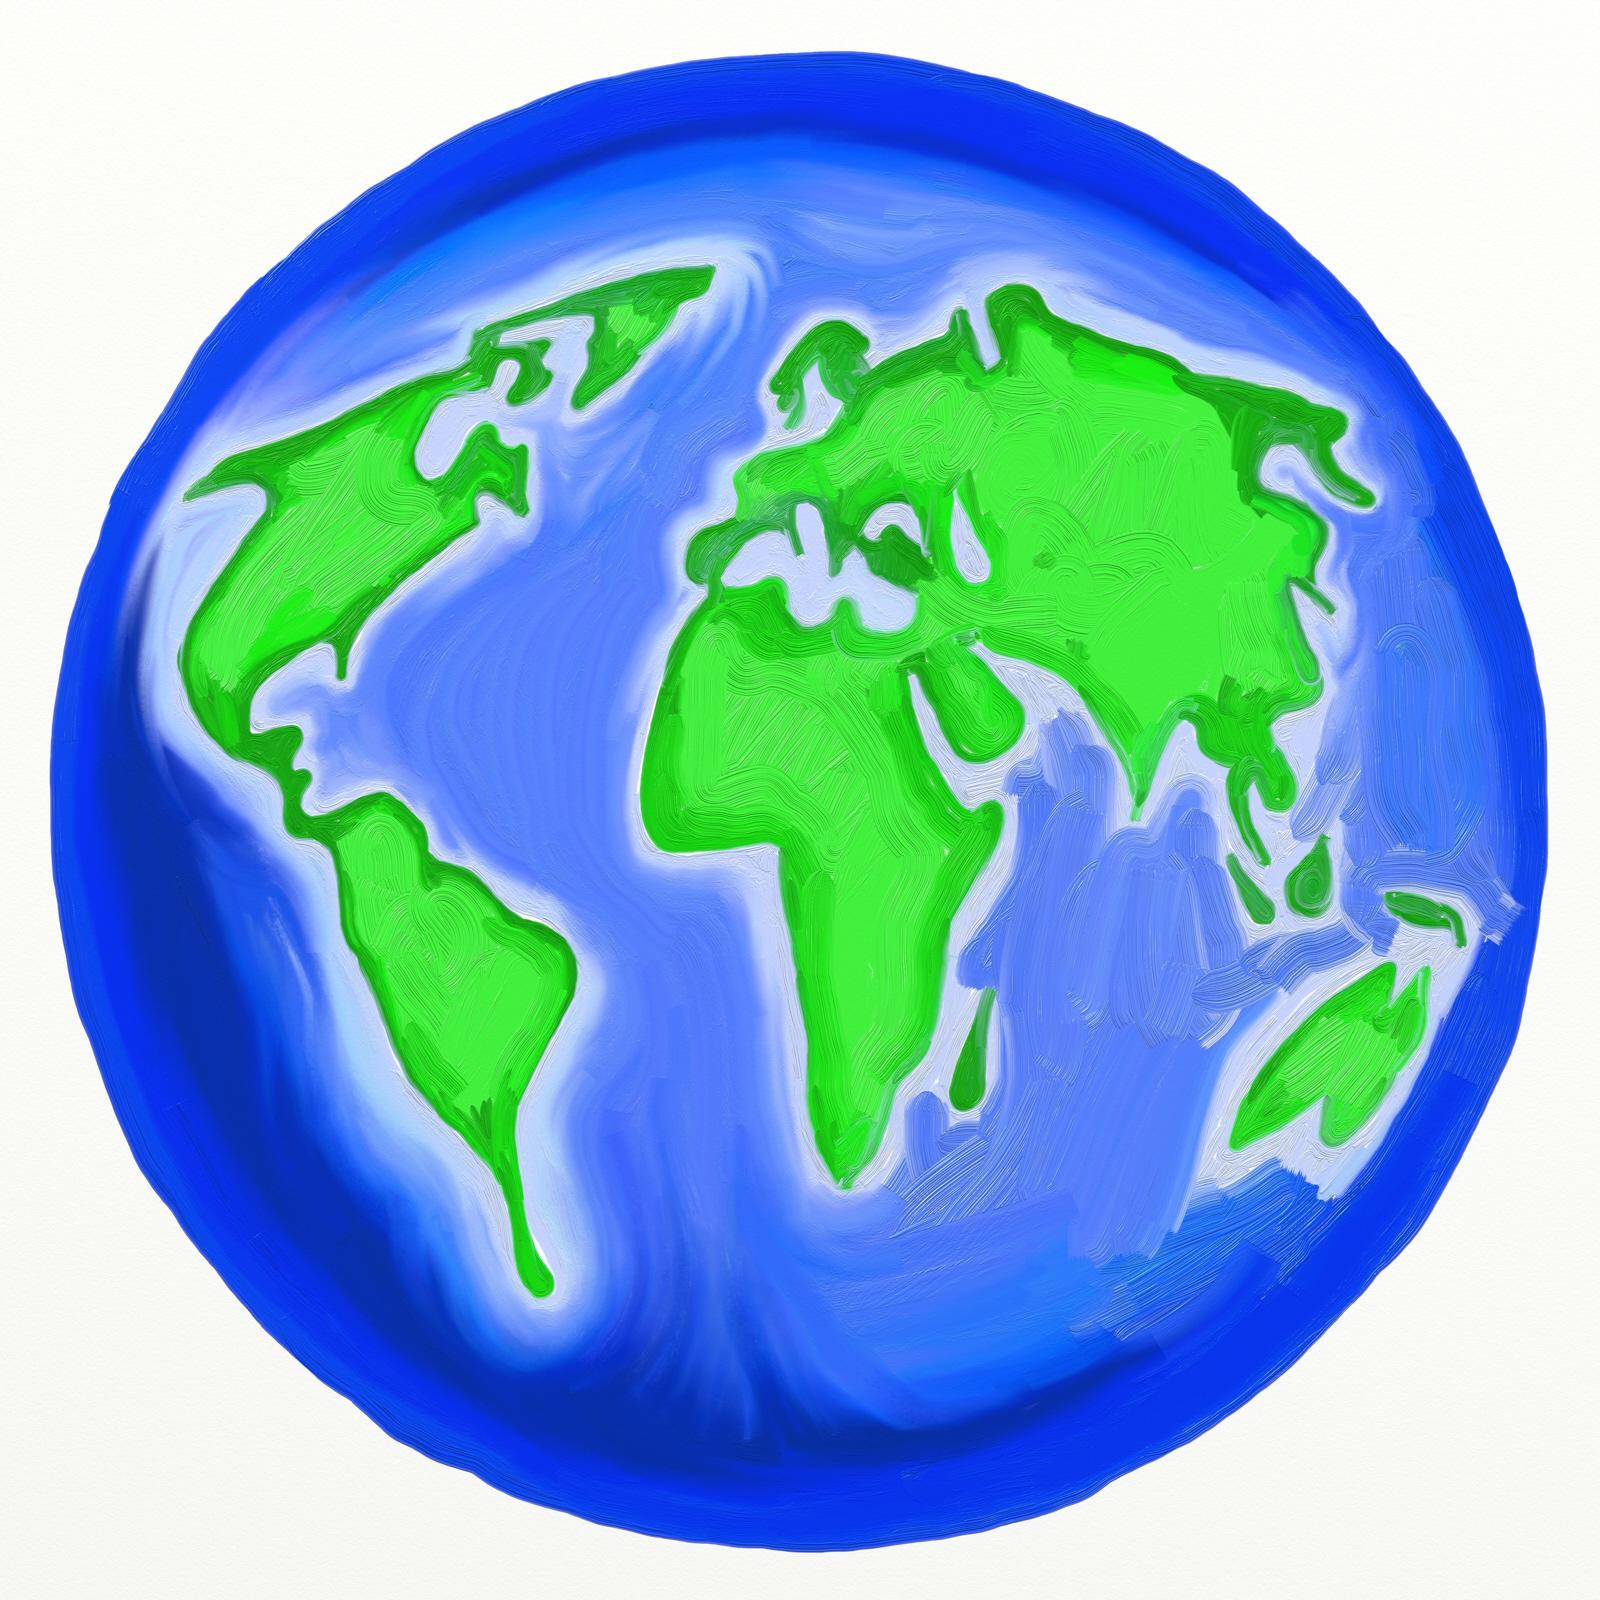 Exportaciones, una ventana al exterior - Juridiomas